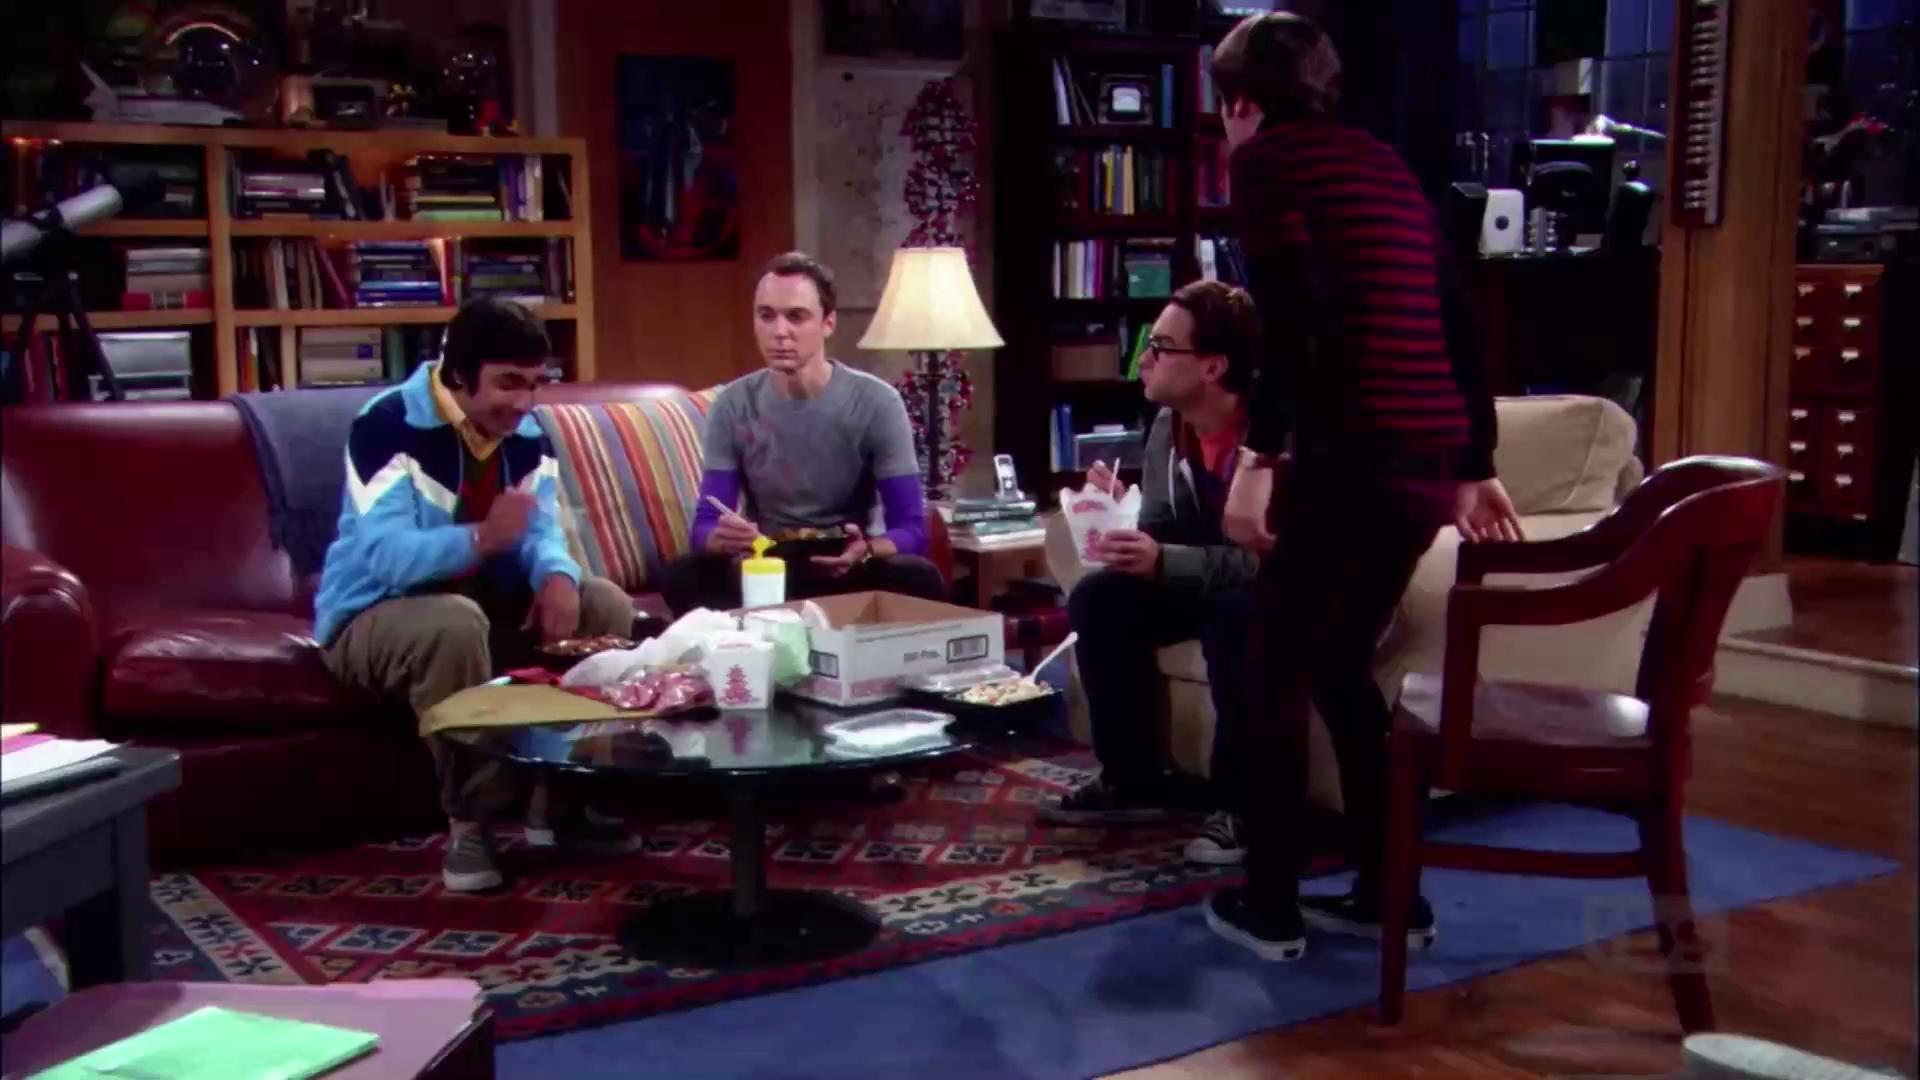 How to Act Like You're Eating, According to 'Big Bang Theory' Star Kunal Nayyar